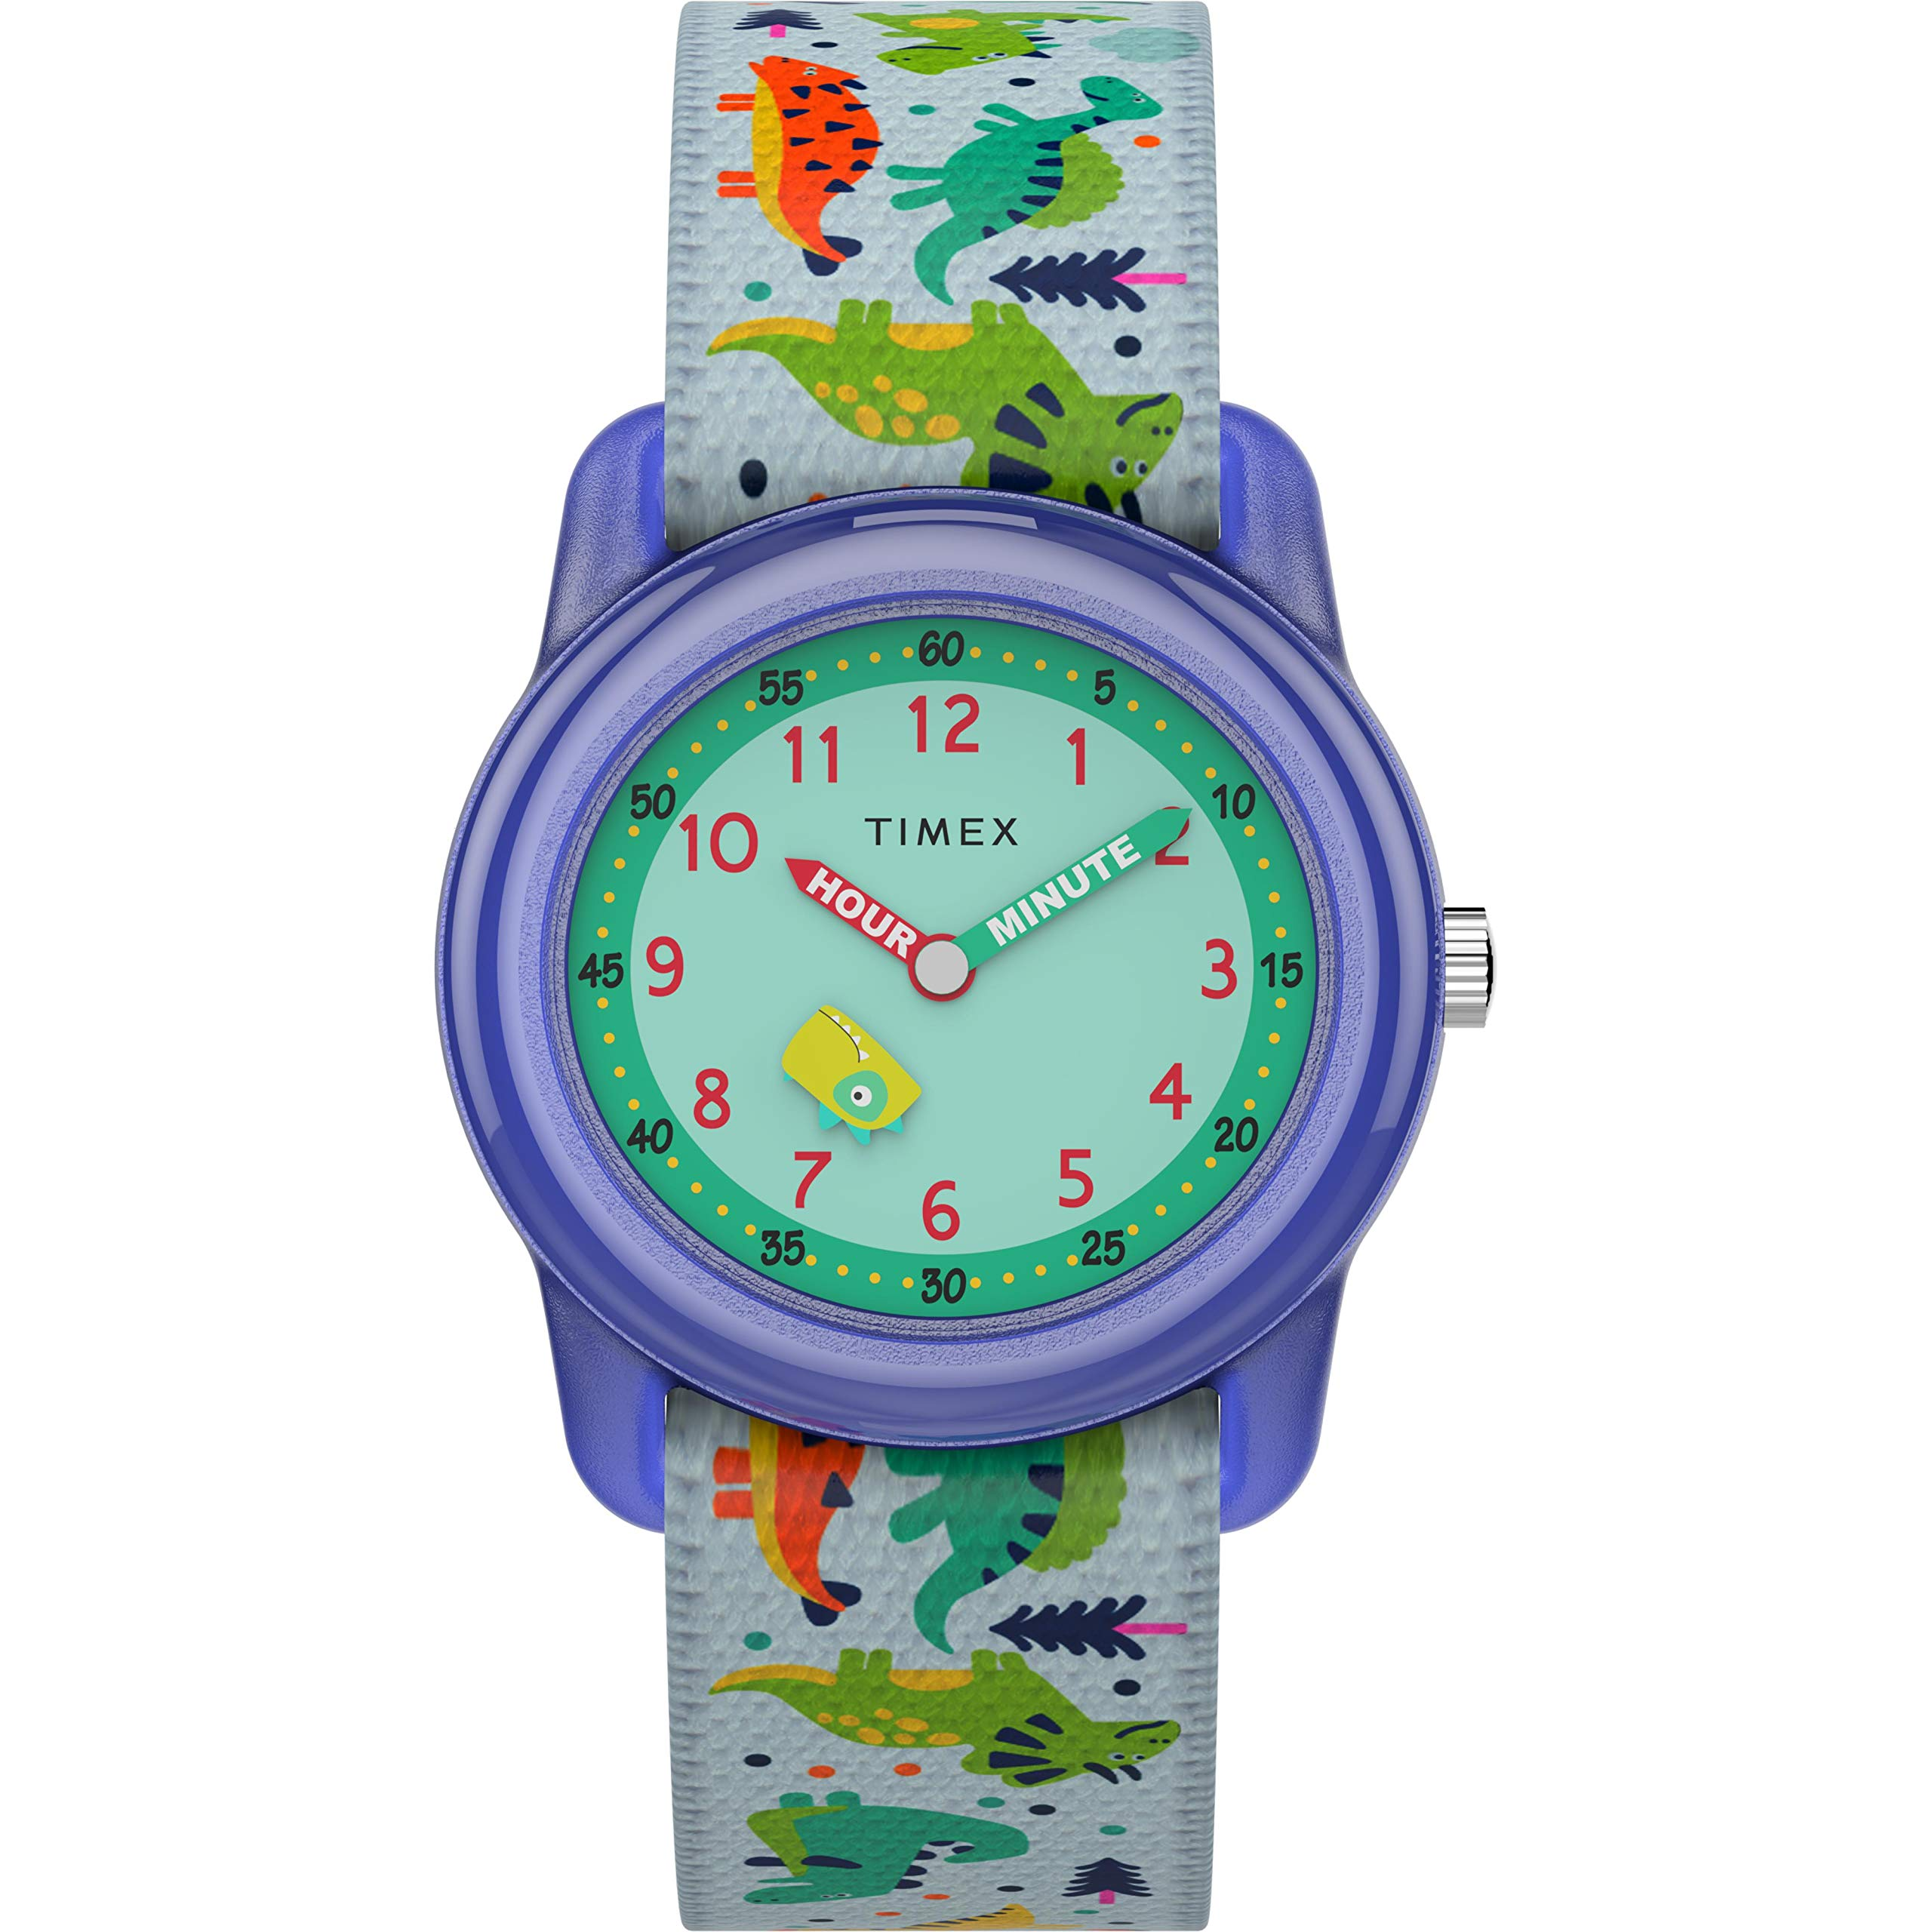 Timex Boys' Time Machines Analog Quartz Nylon Strap, White, 16 Casual Watch (Model: TW7C773009J) by Timex